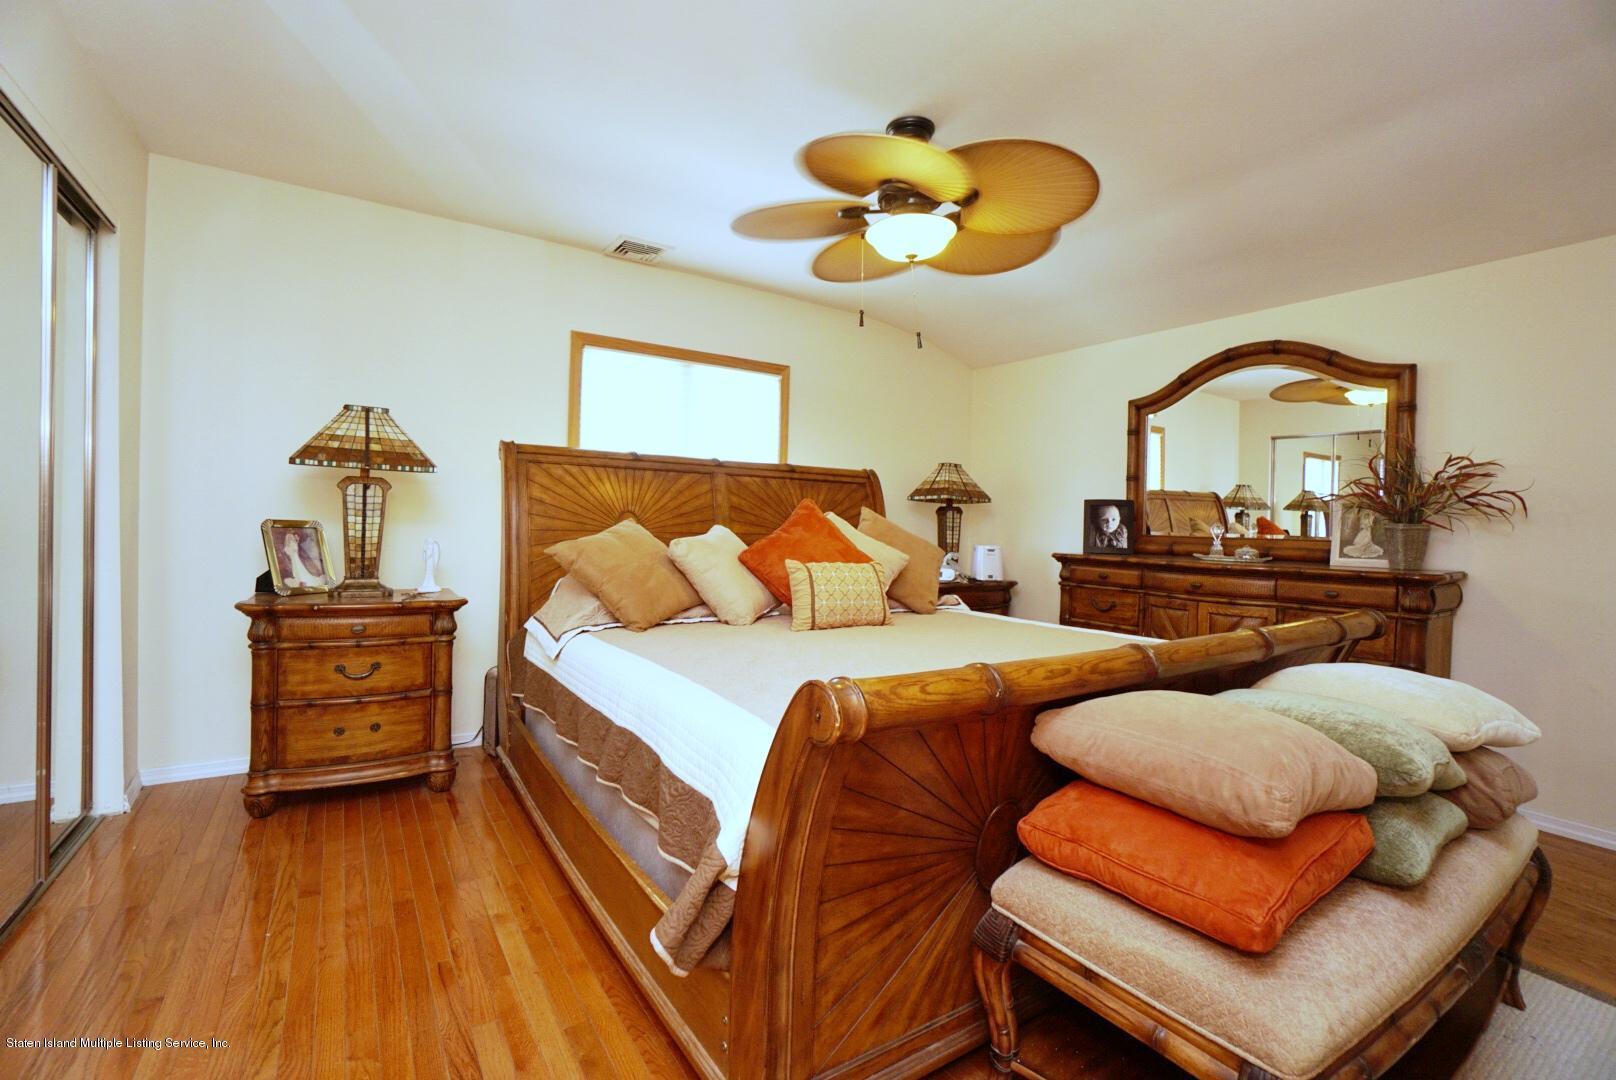 Single Family - Semi-Attached 47 Ilyse Court   Staten Island, NY 10306, MLS-1141335-14